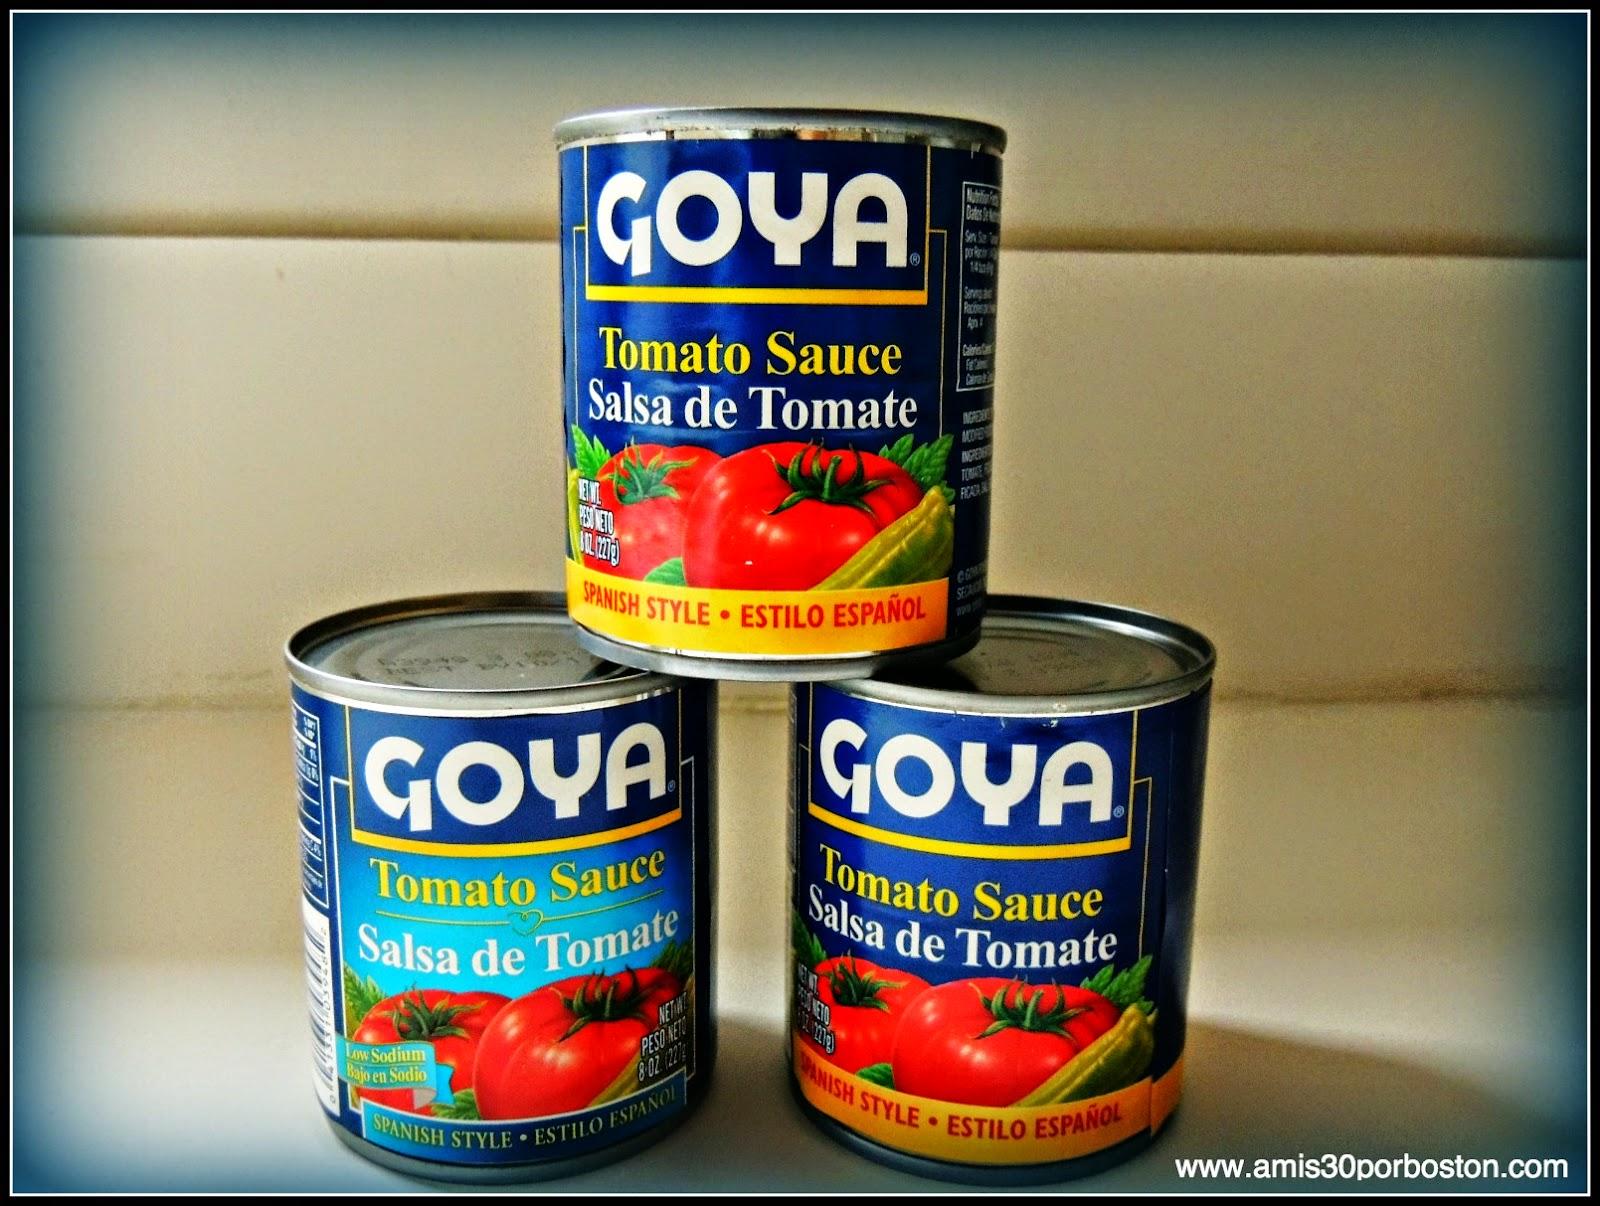 Goya: Salsa de Tomate